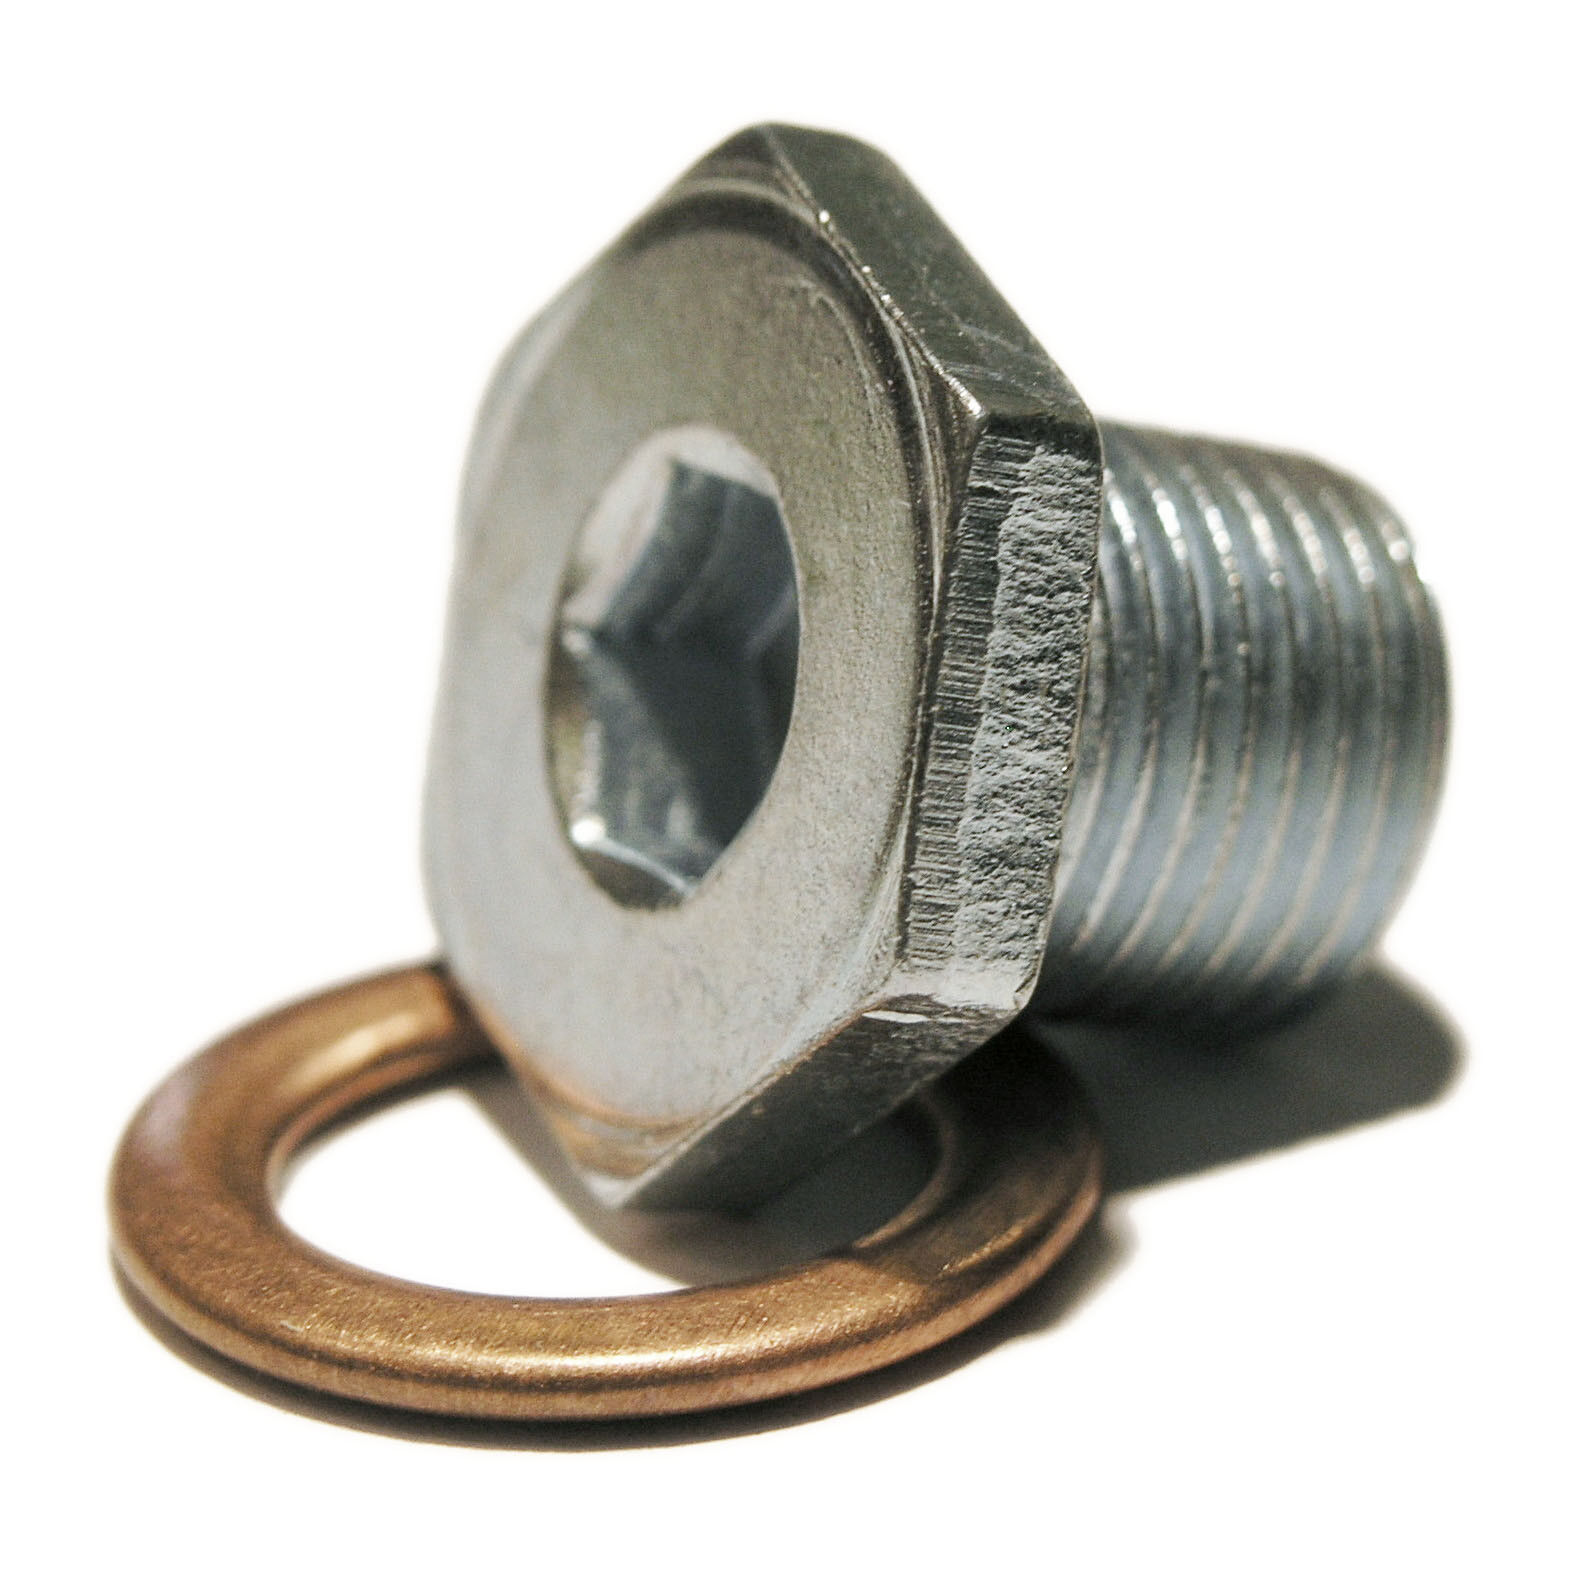 Petrol//Diesel Volvo Oil Sump Drain Plug Washer V70 C70 S60 S80 C30 V50 XC70